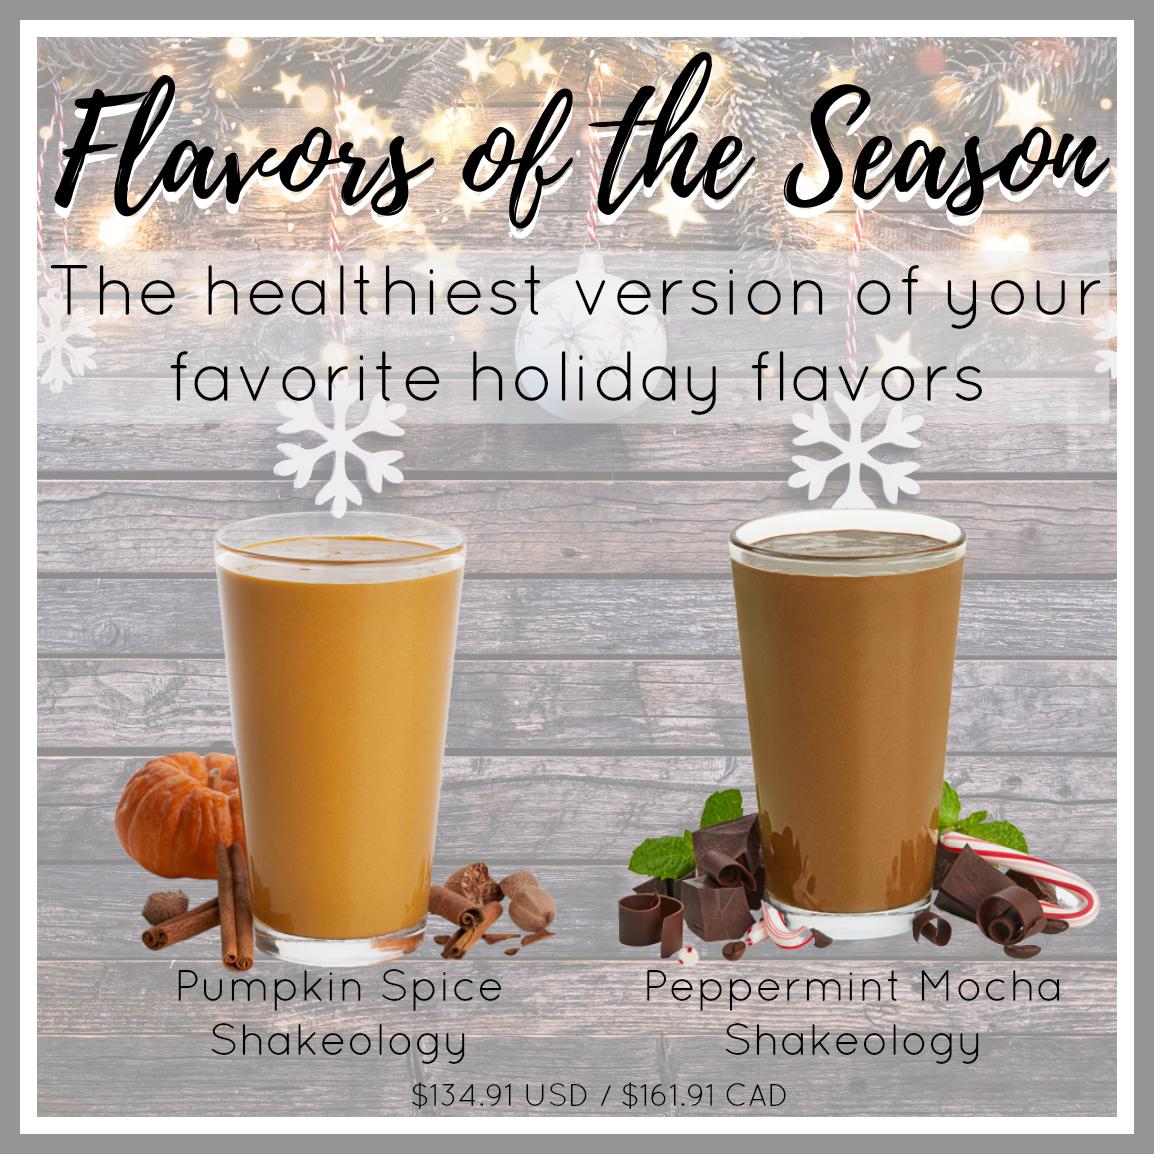 17. Flavors of the Season